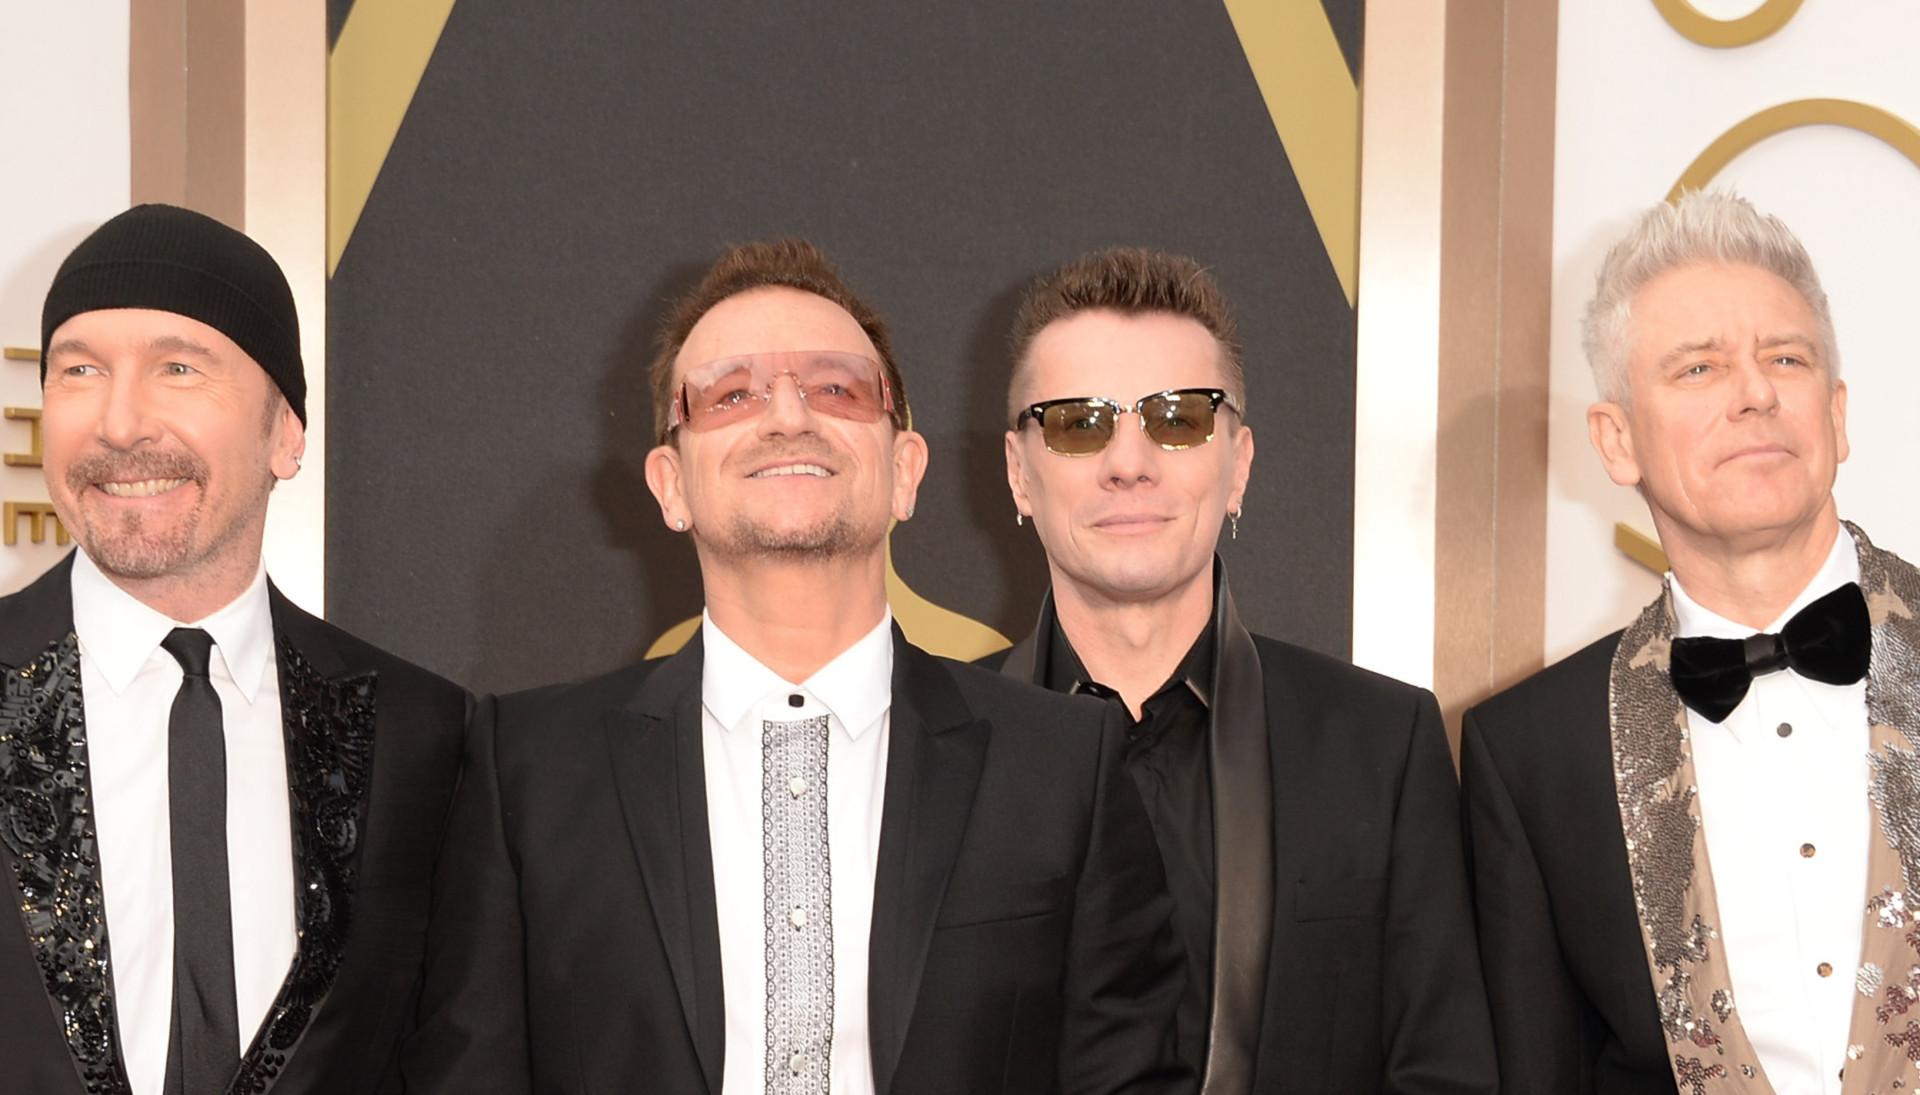 U2: The incredible story so far